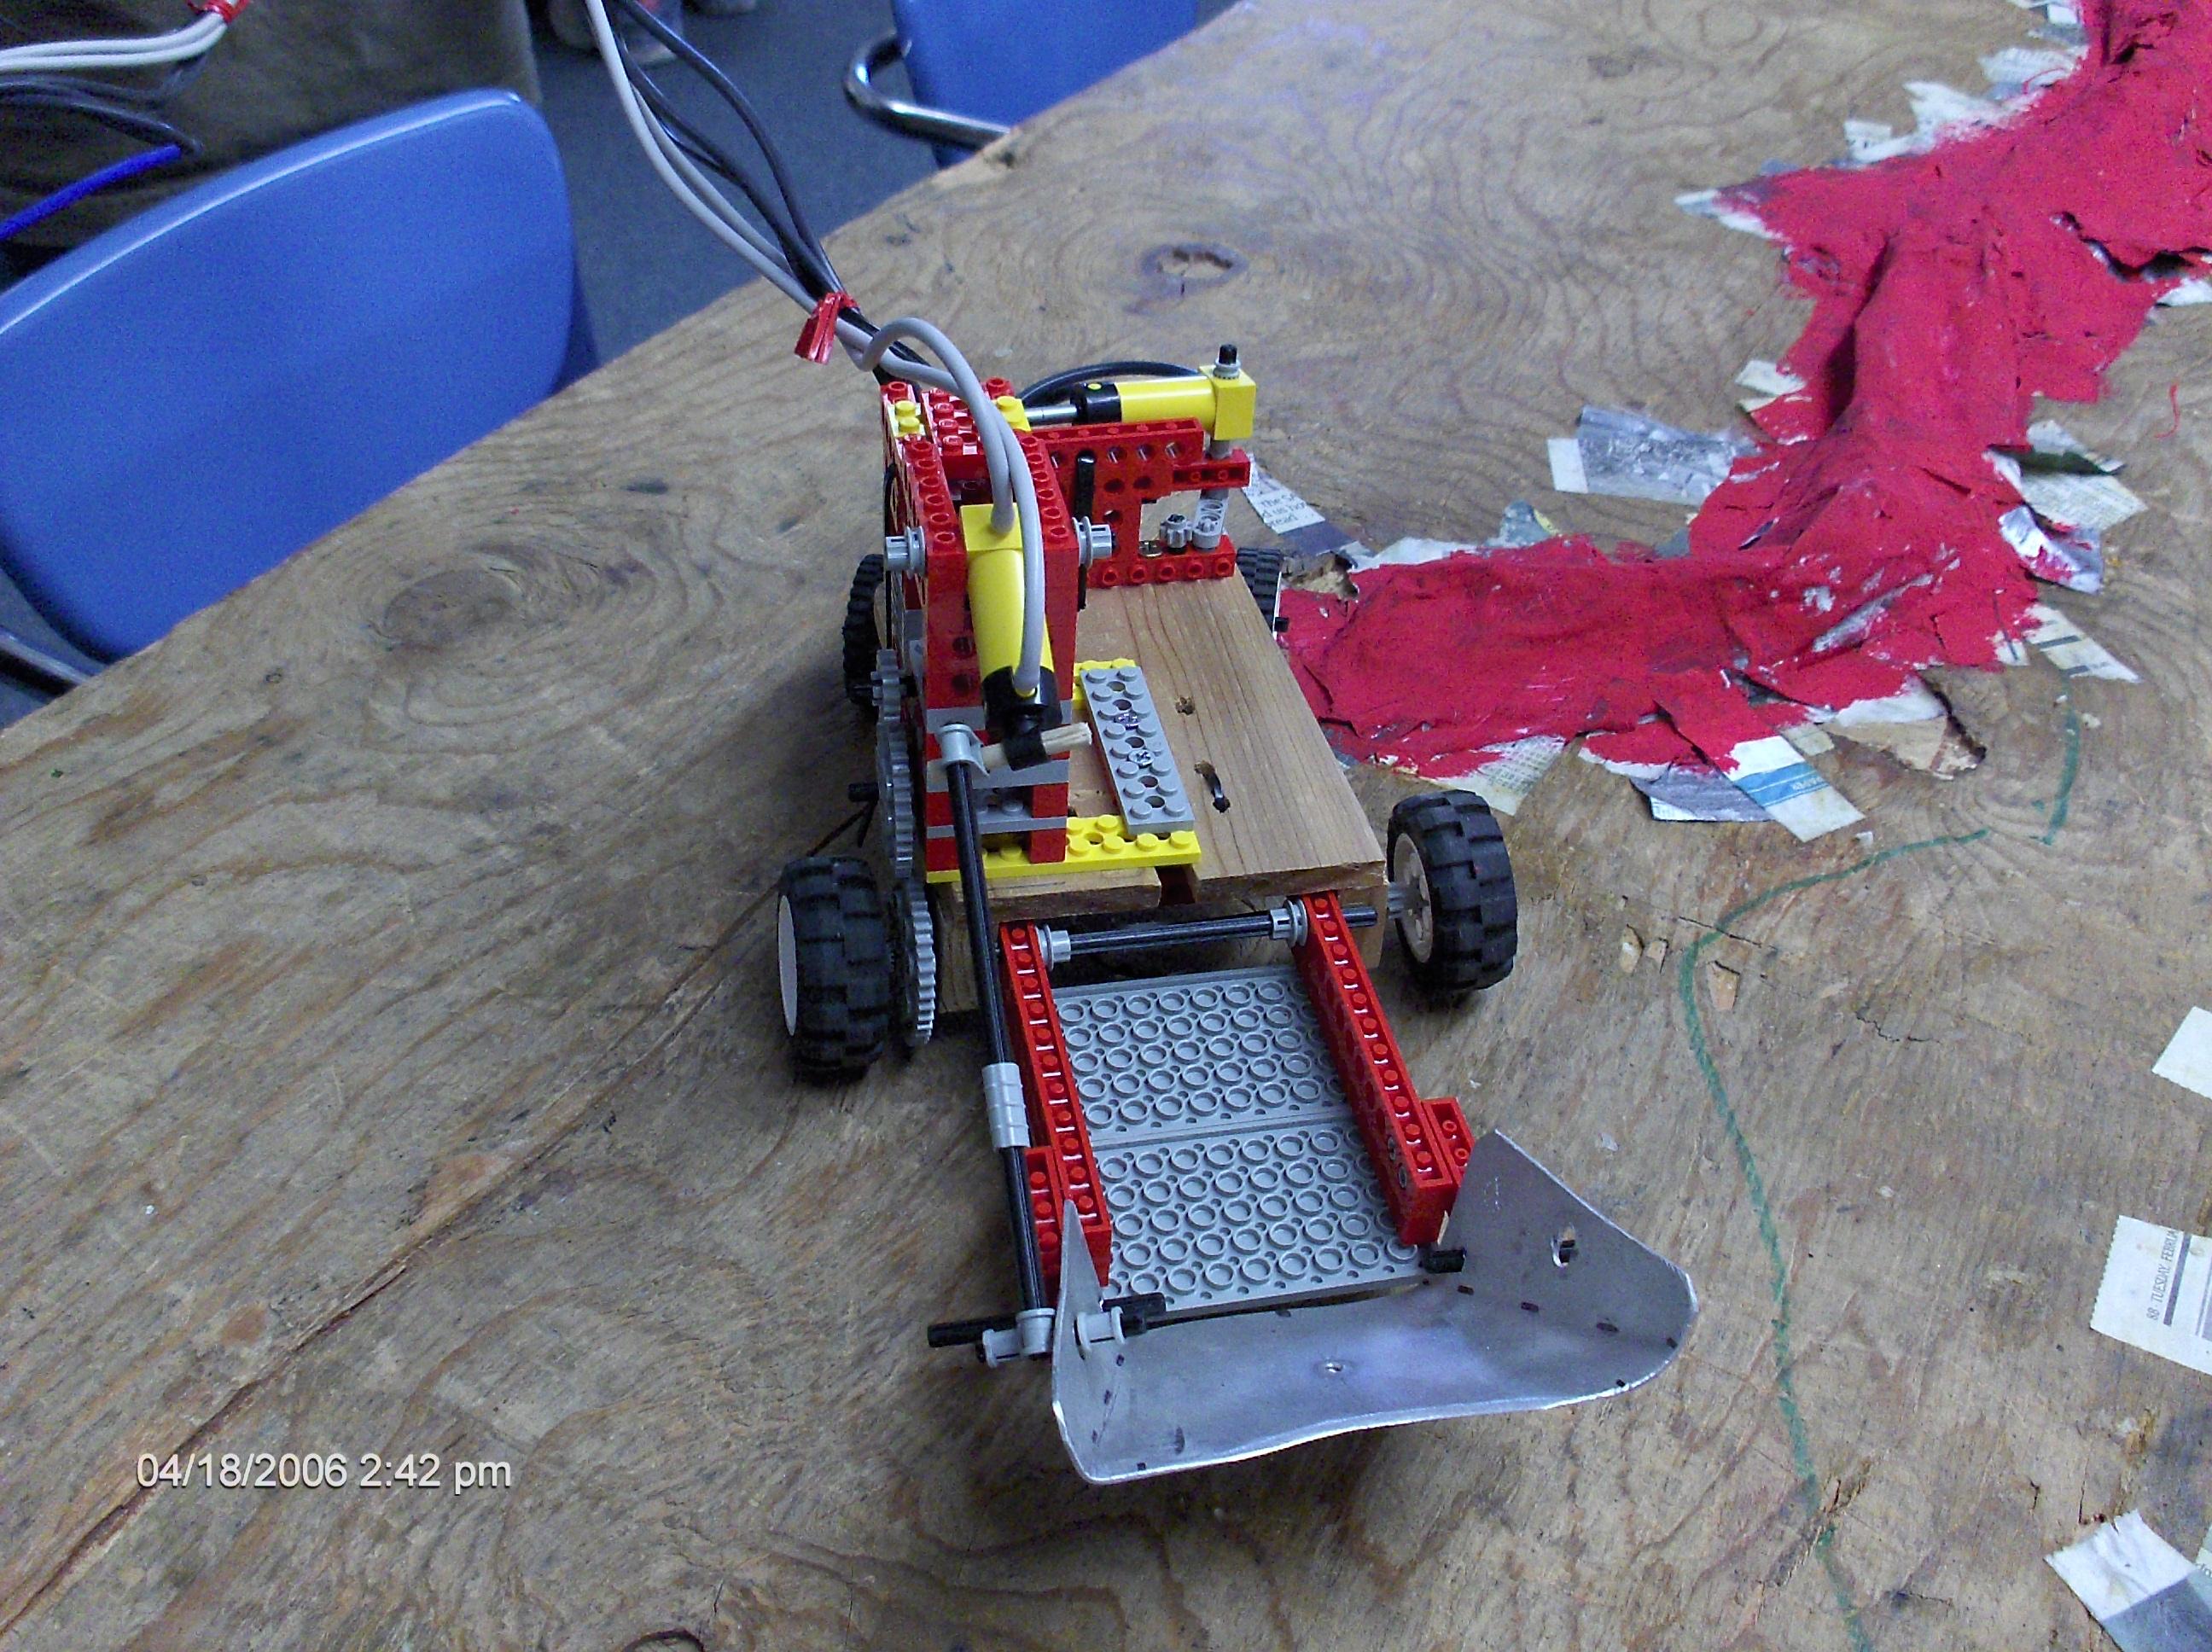 mars rover school project - photo #11